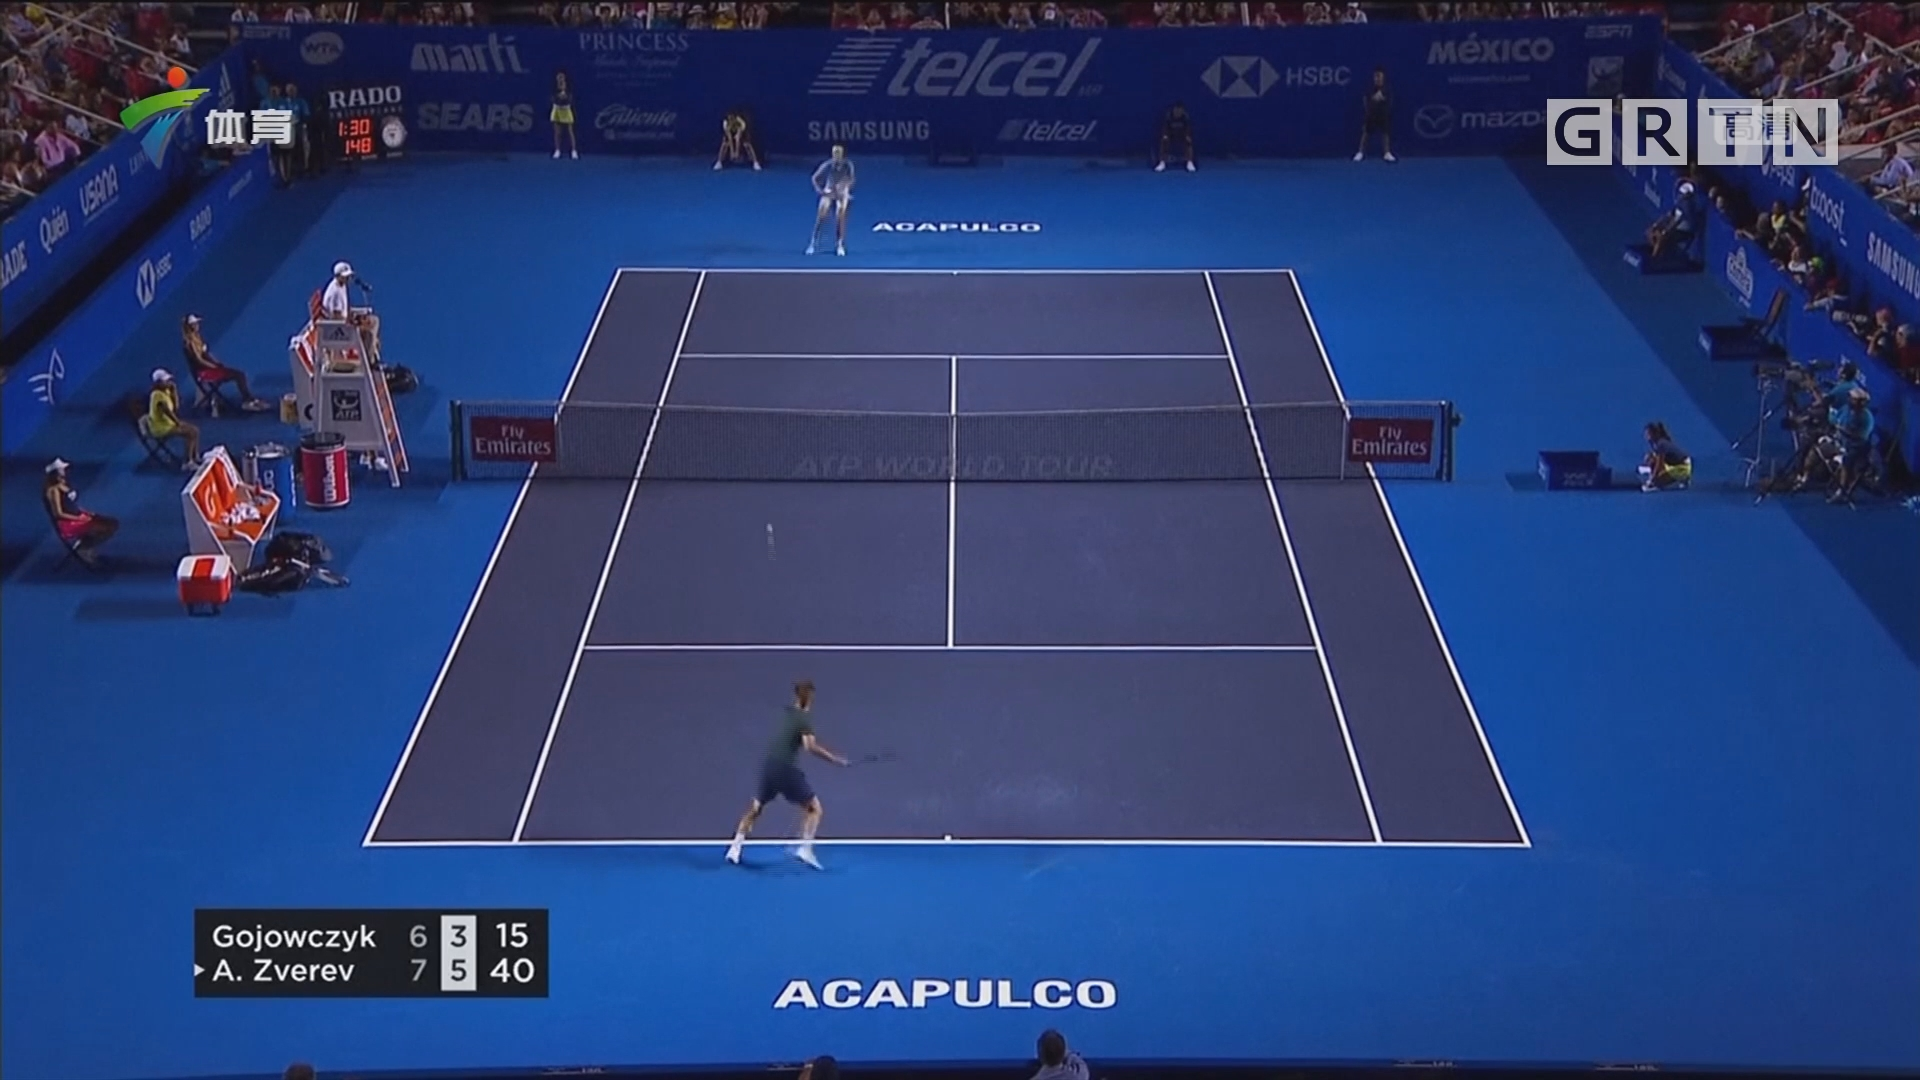 ATP墨西哥赛 兹维列夫力克高约维茨克